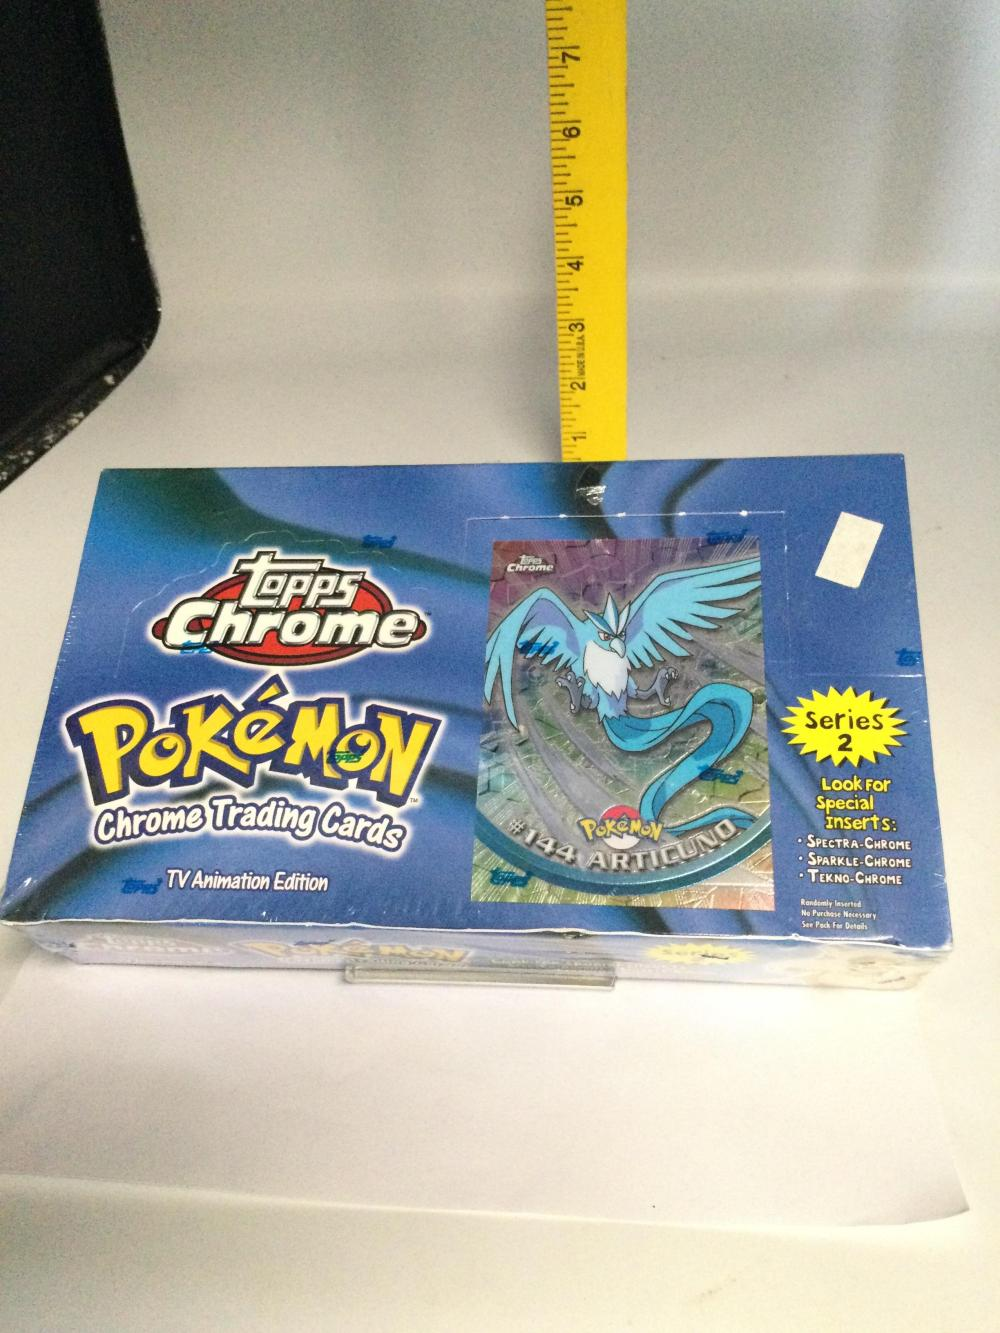 Pokémon Chrome Trading Cards